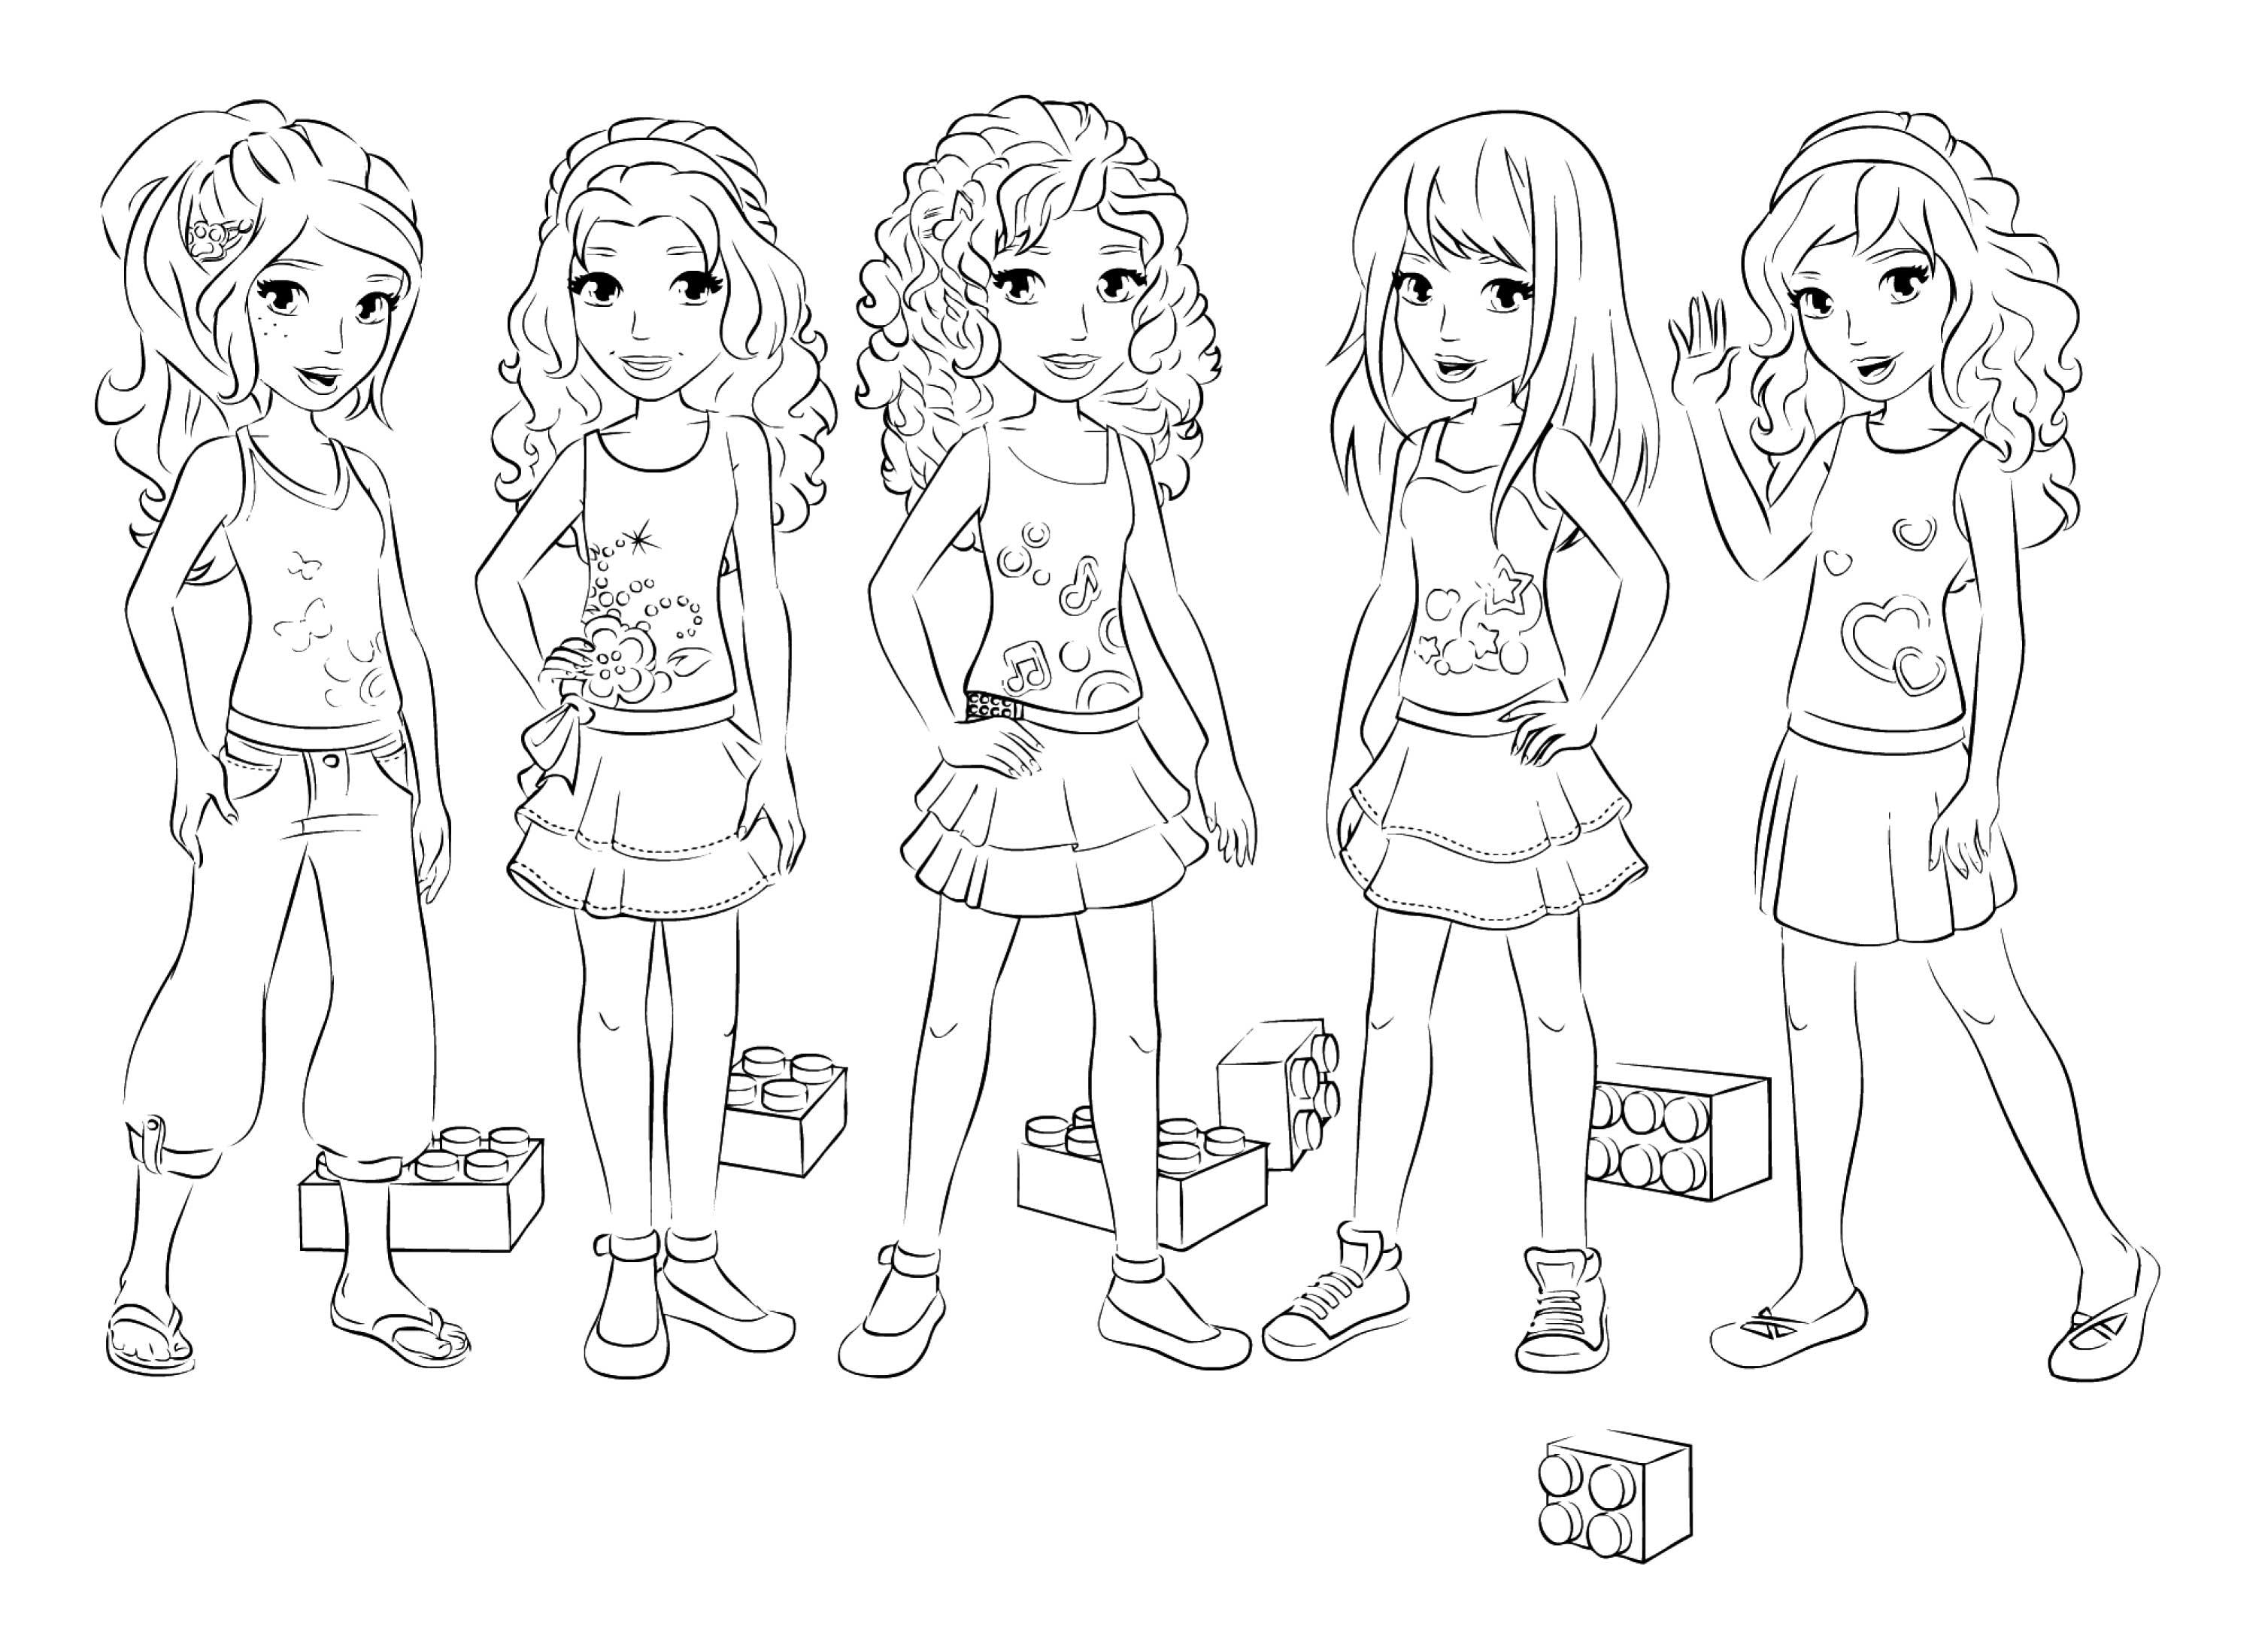 lego friends colorear dibujos - Dibujalandia